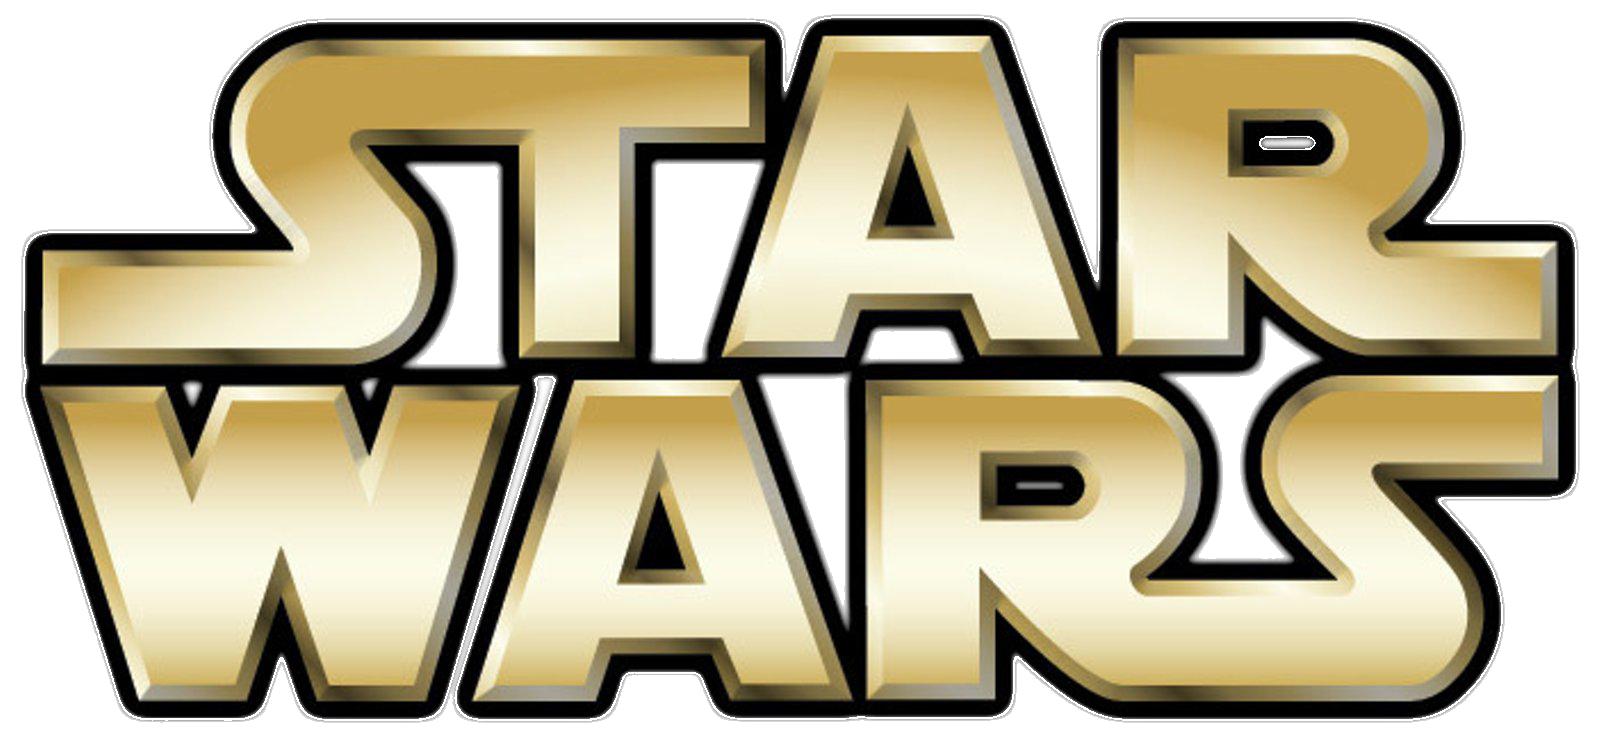 Star-Wars-Logo-PNG-File.png